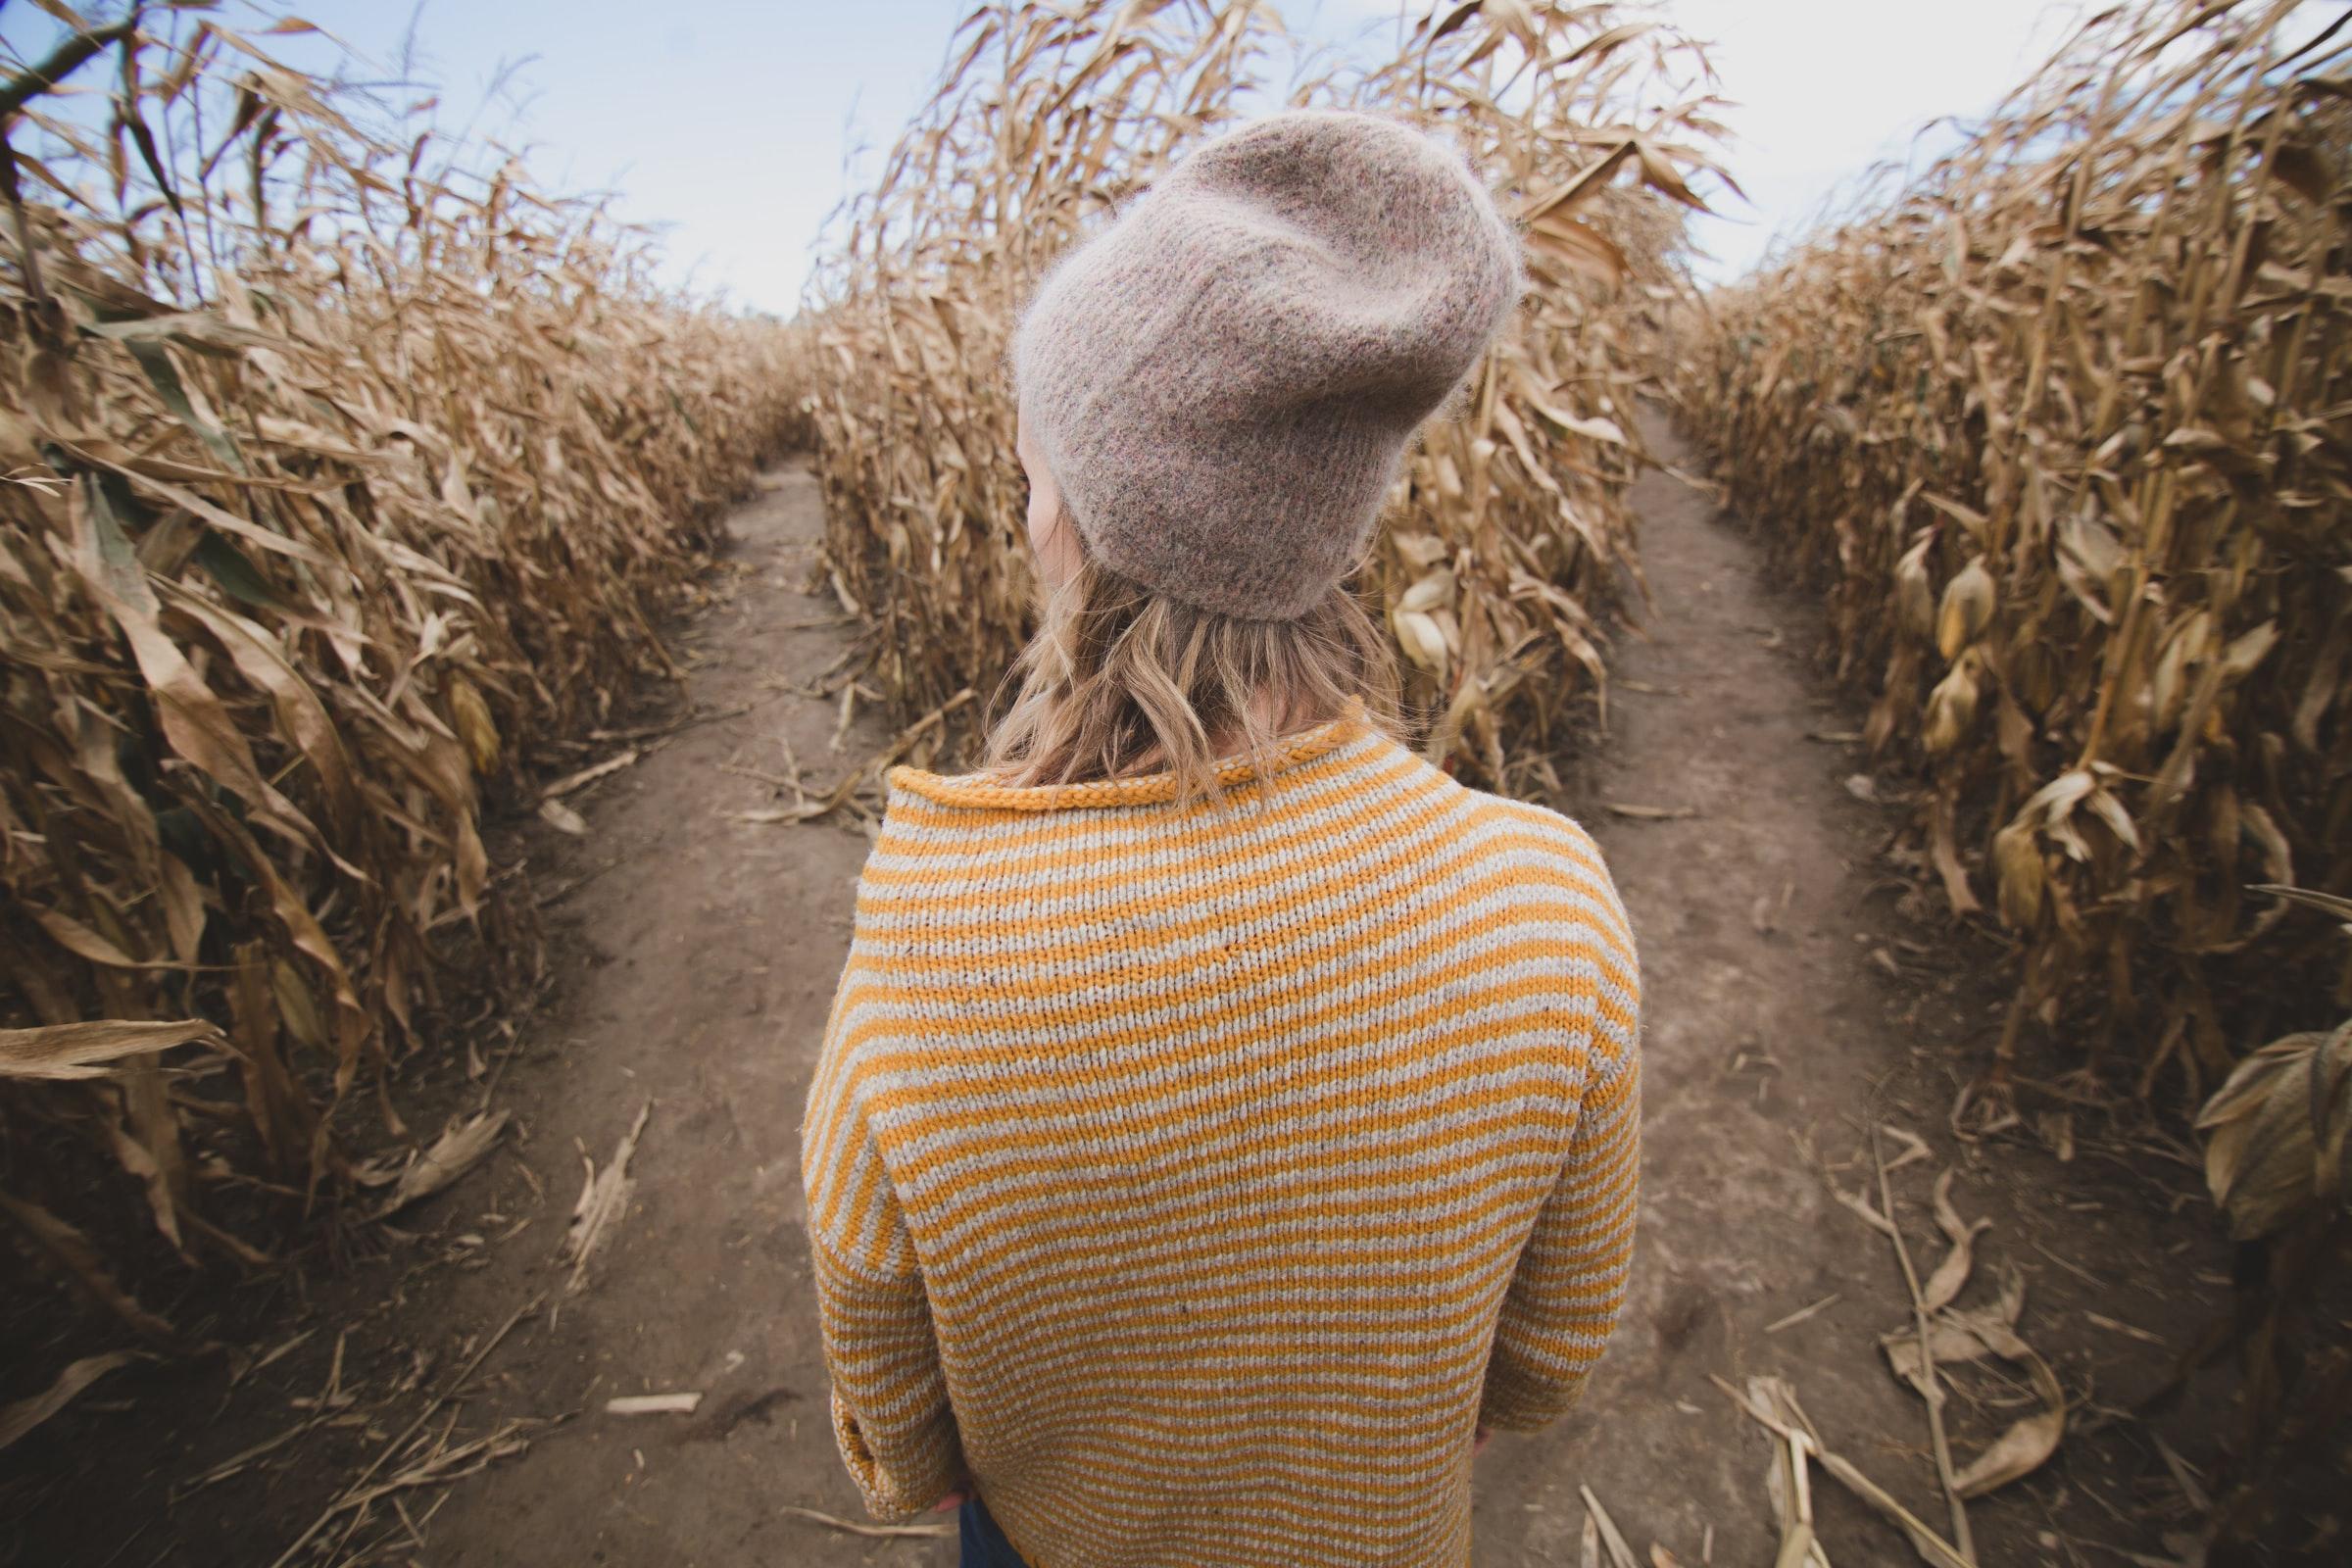 Choosing to do an IUI vs. IVF